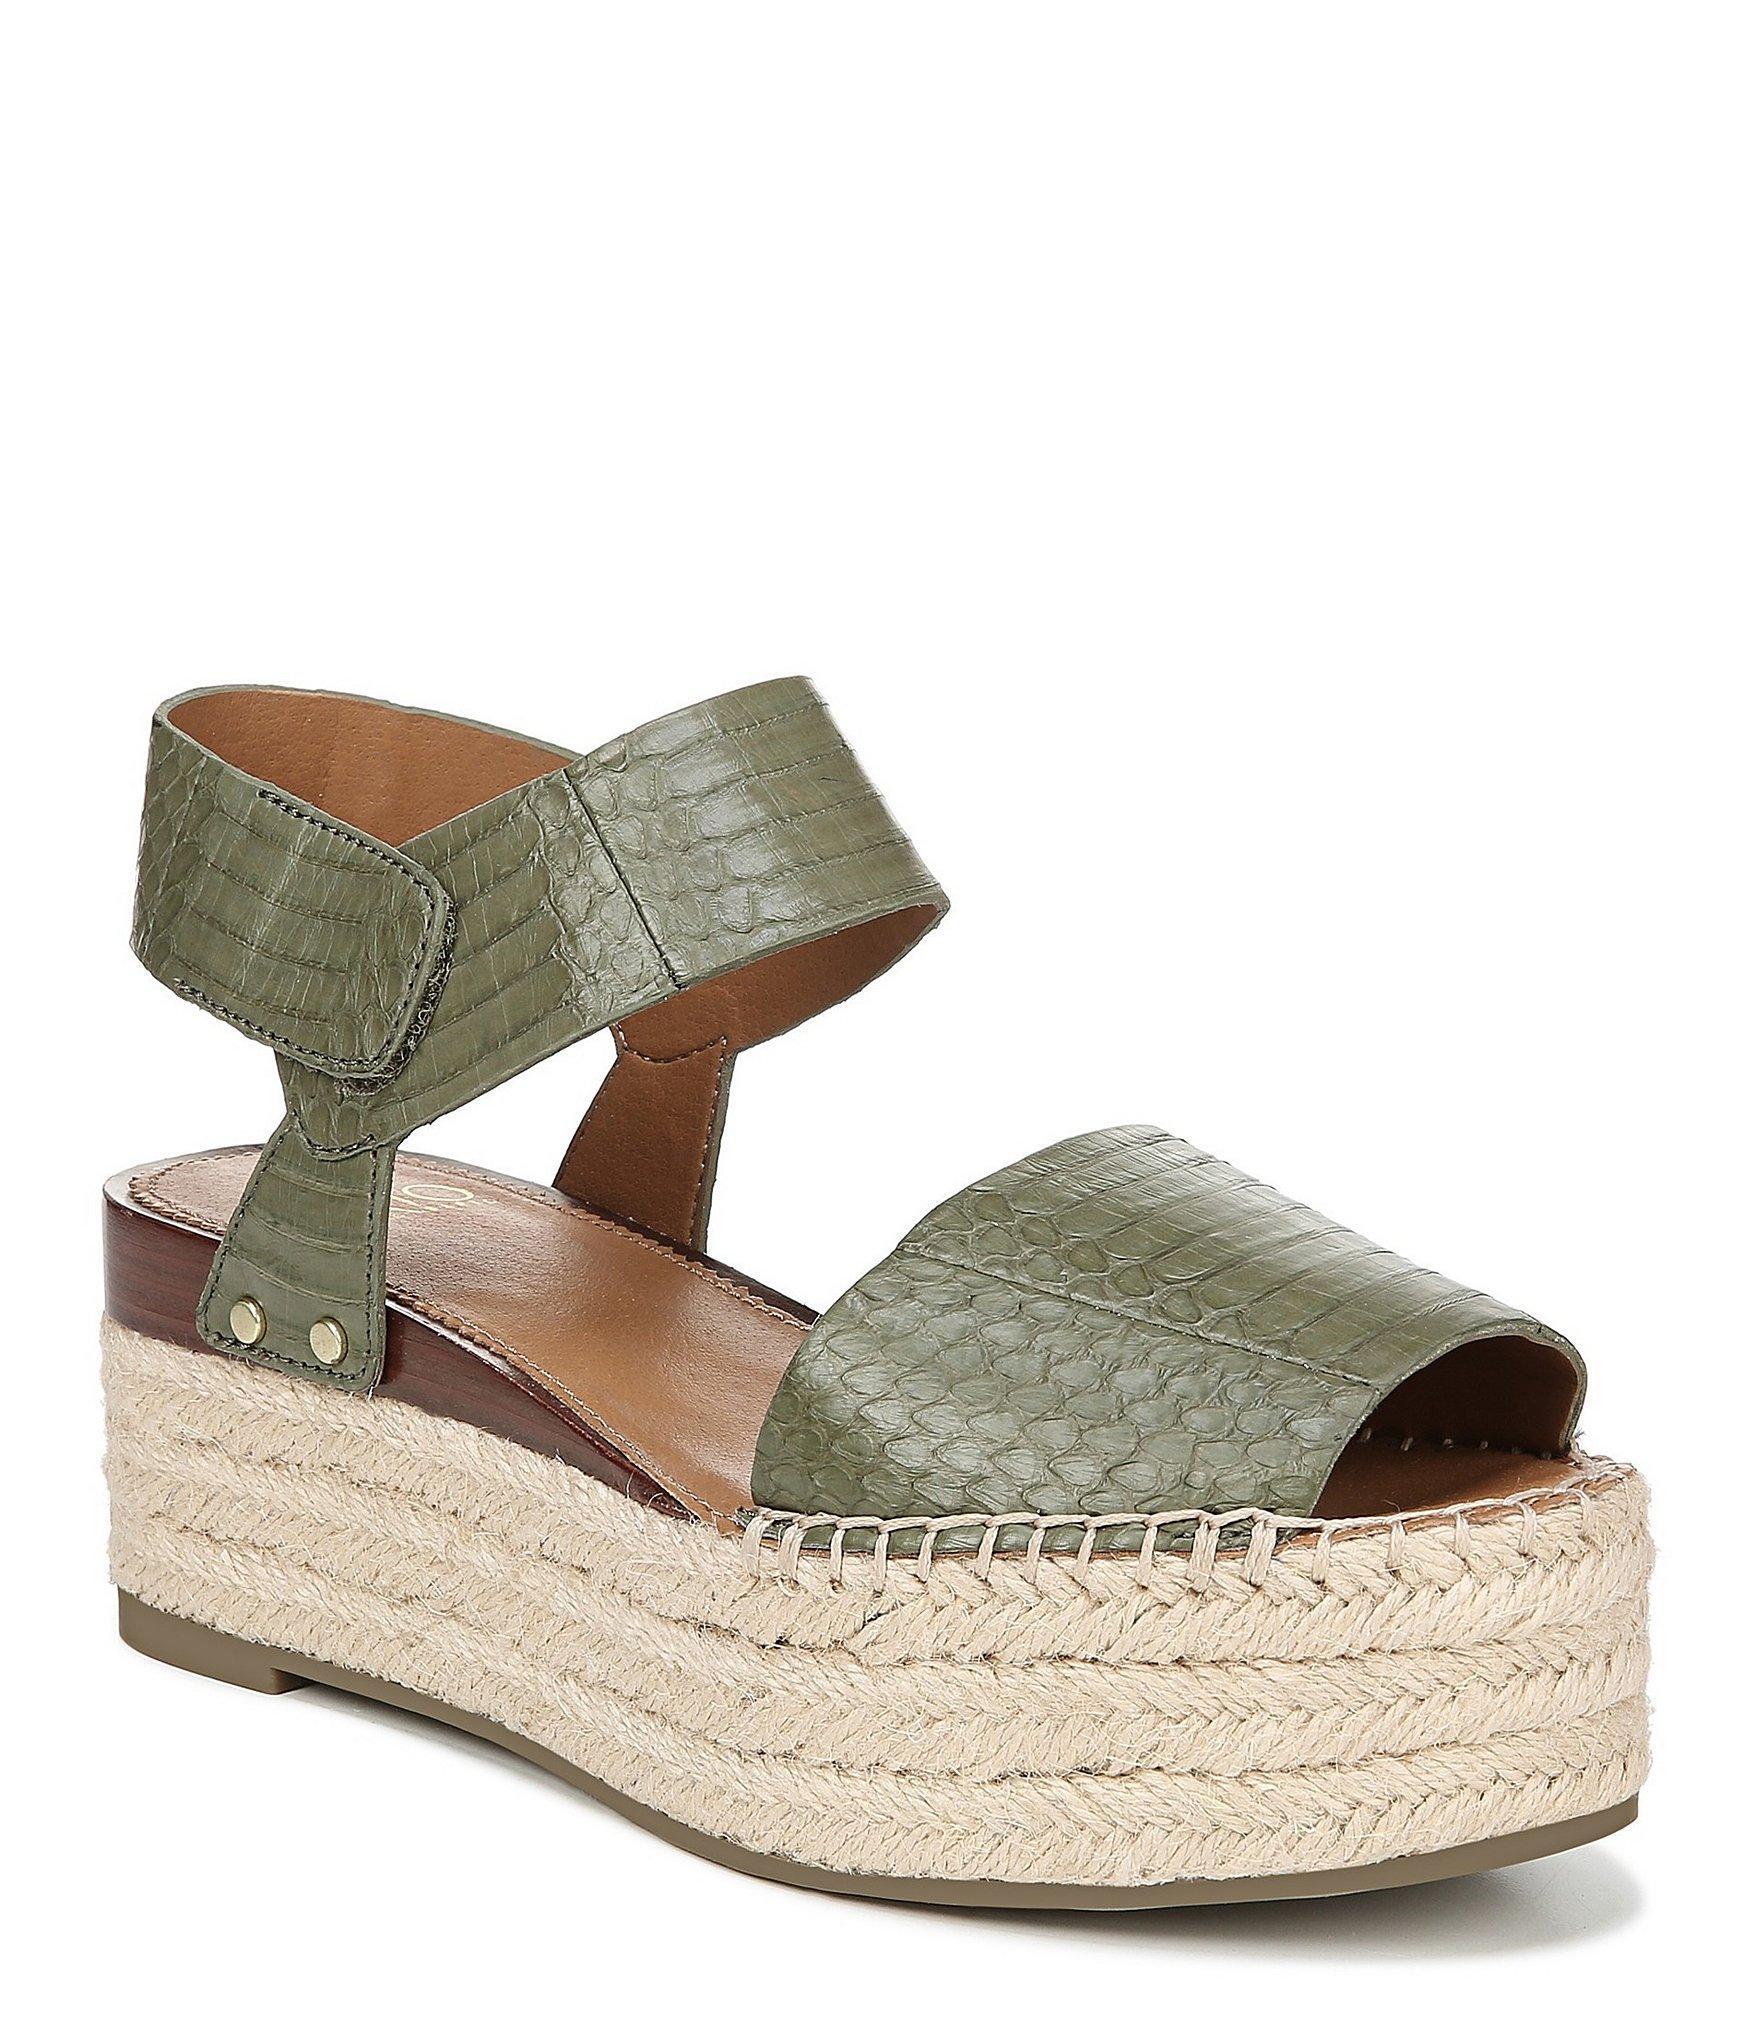 7093c503b5 Franco Sarto. Women's Green Sarto By Leo2 Espadrille Snake Print Leather Flatform  Sandals